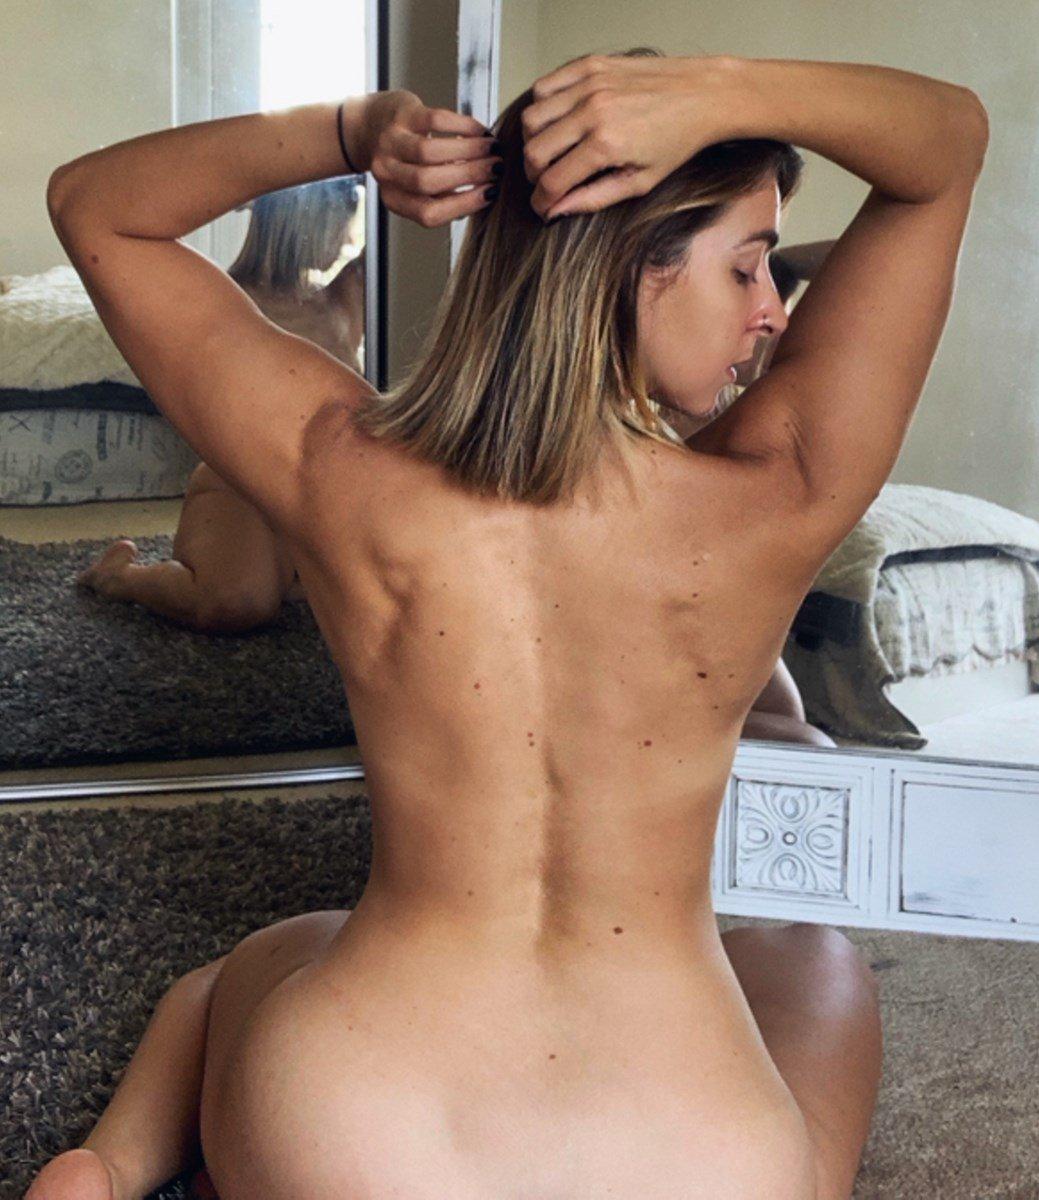 Gabbie Hanna Nude Photos And Pussy Lips Slip